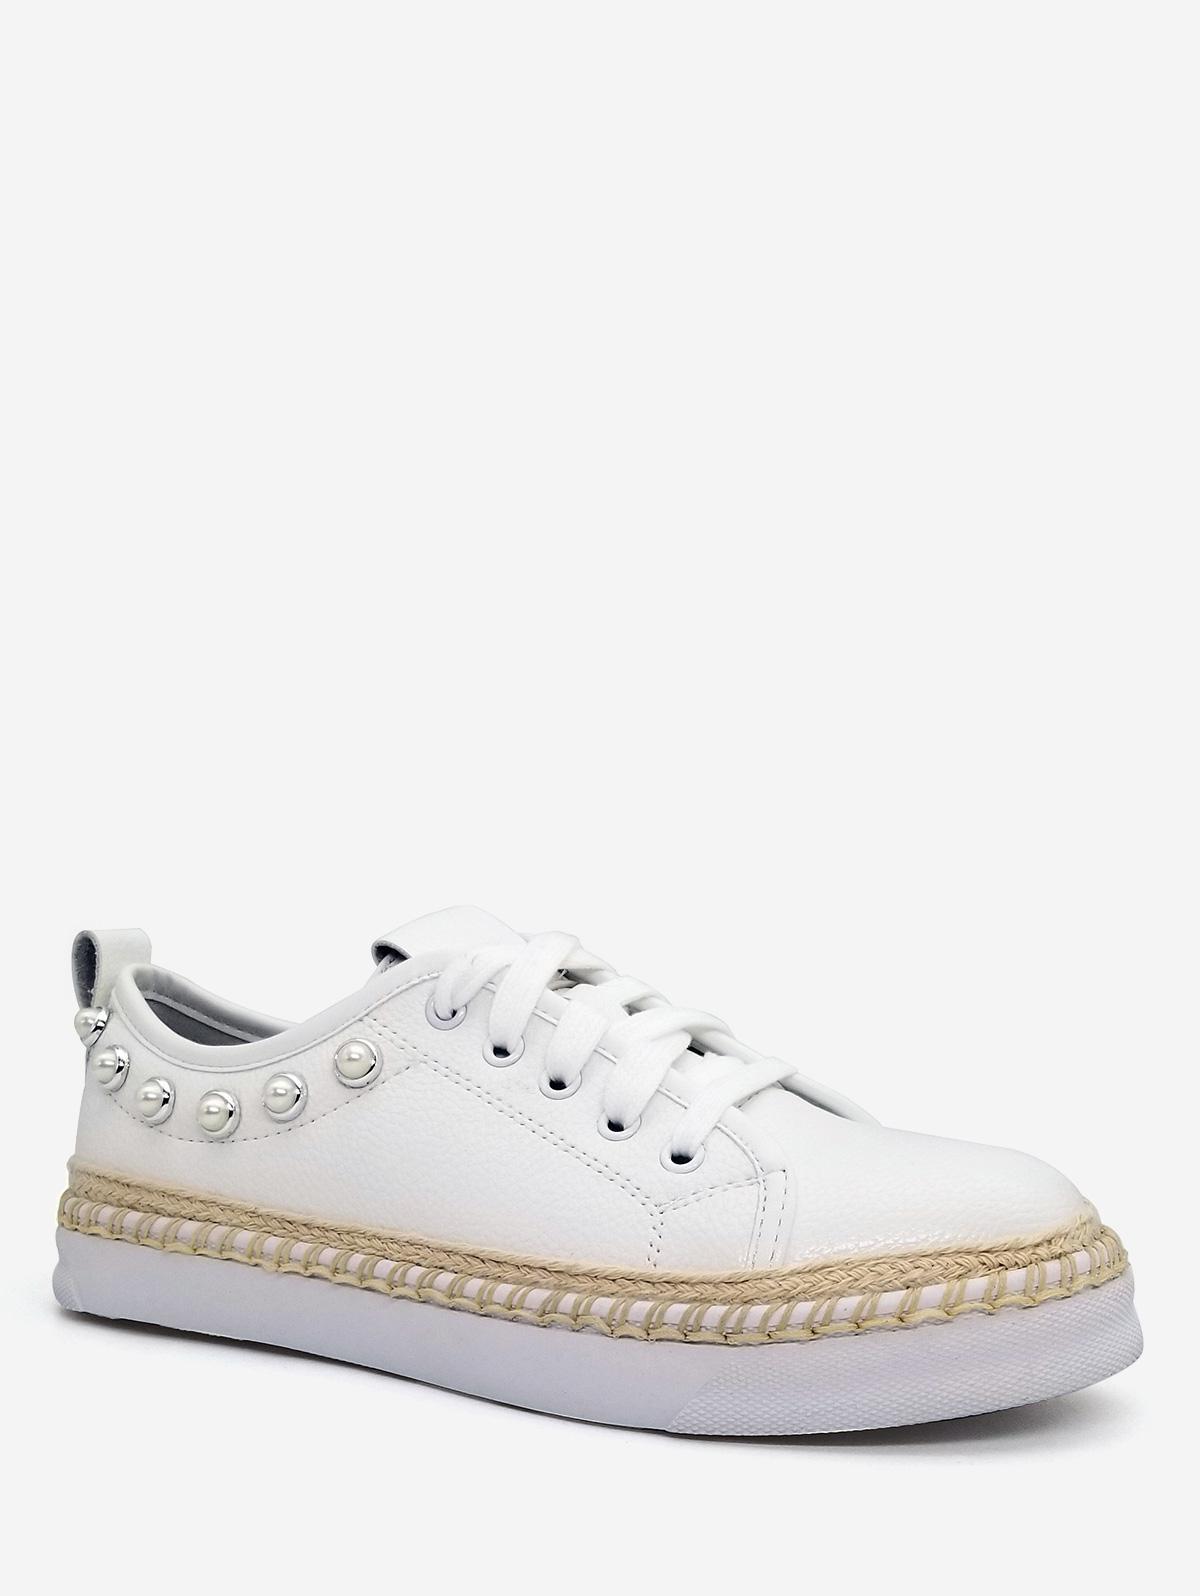 Perla Di Faux Decorativi Low Top Sneakers